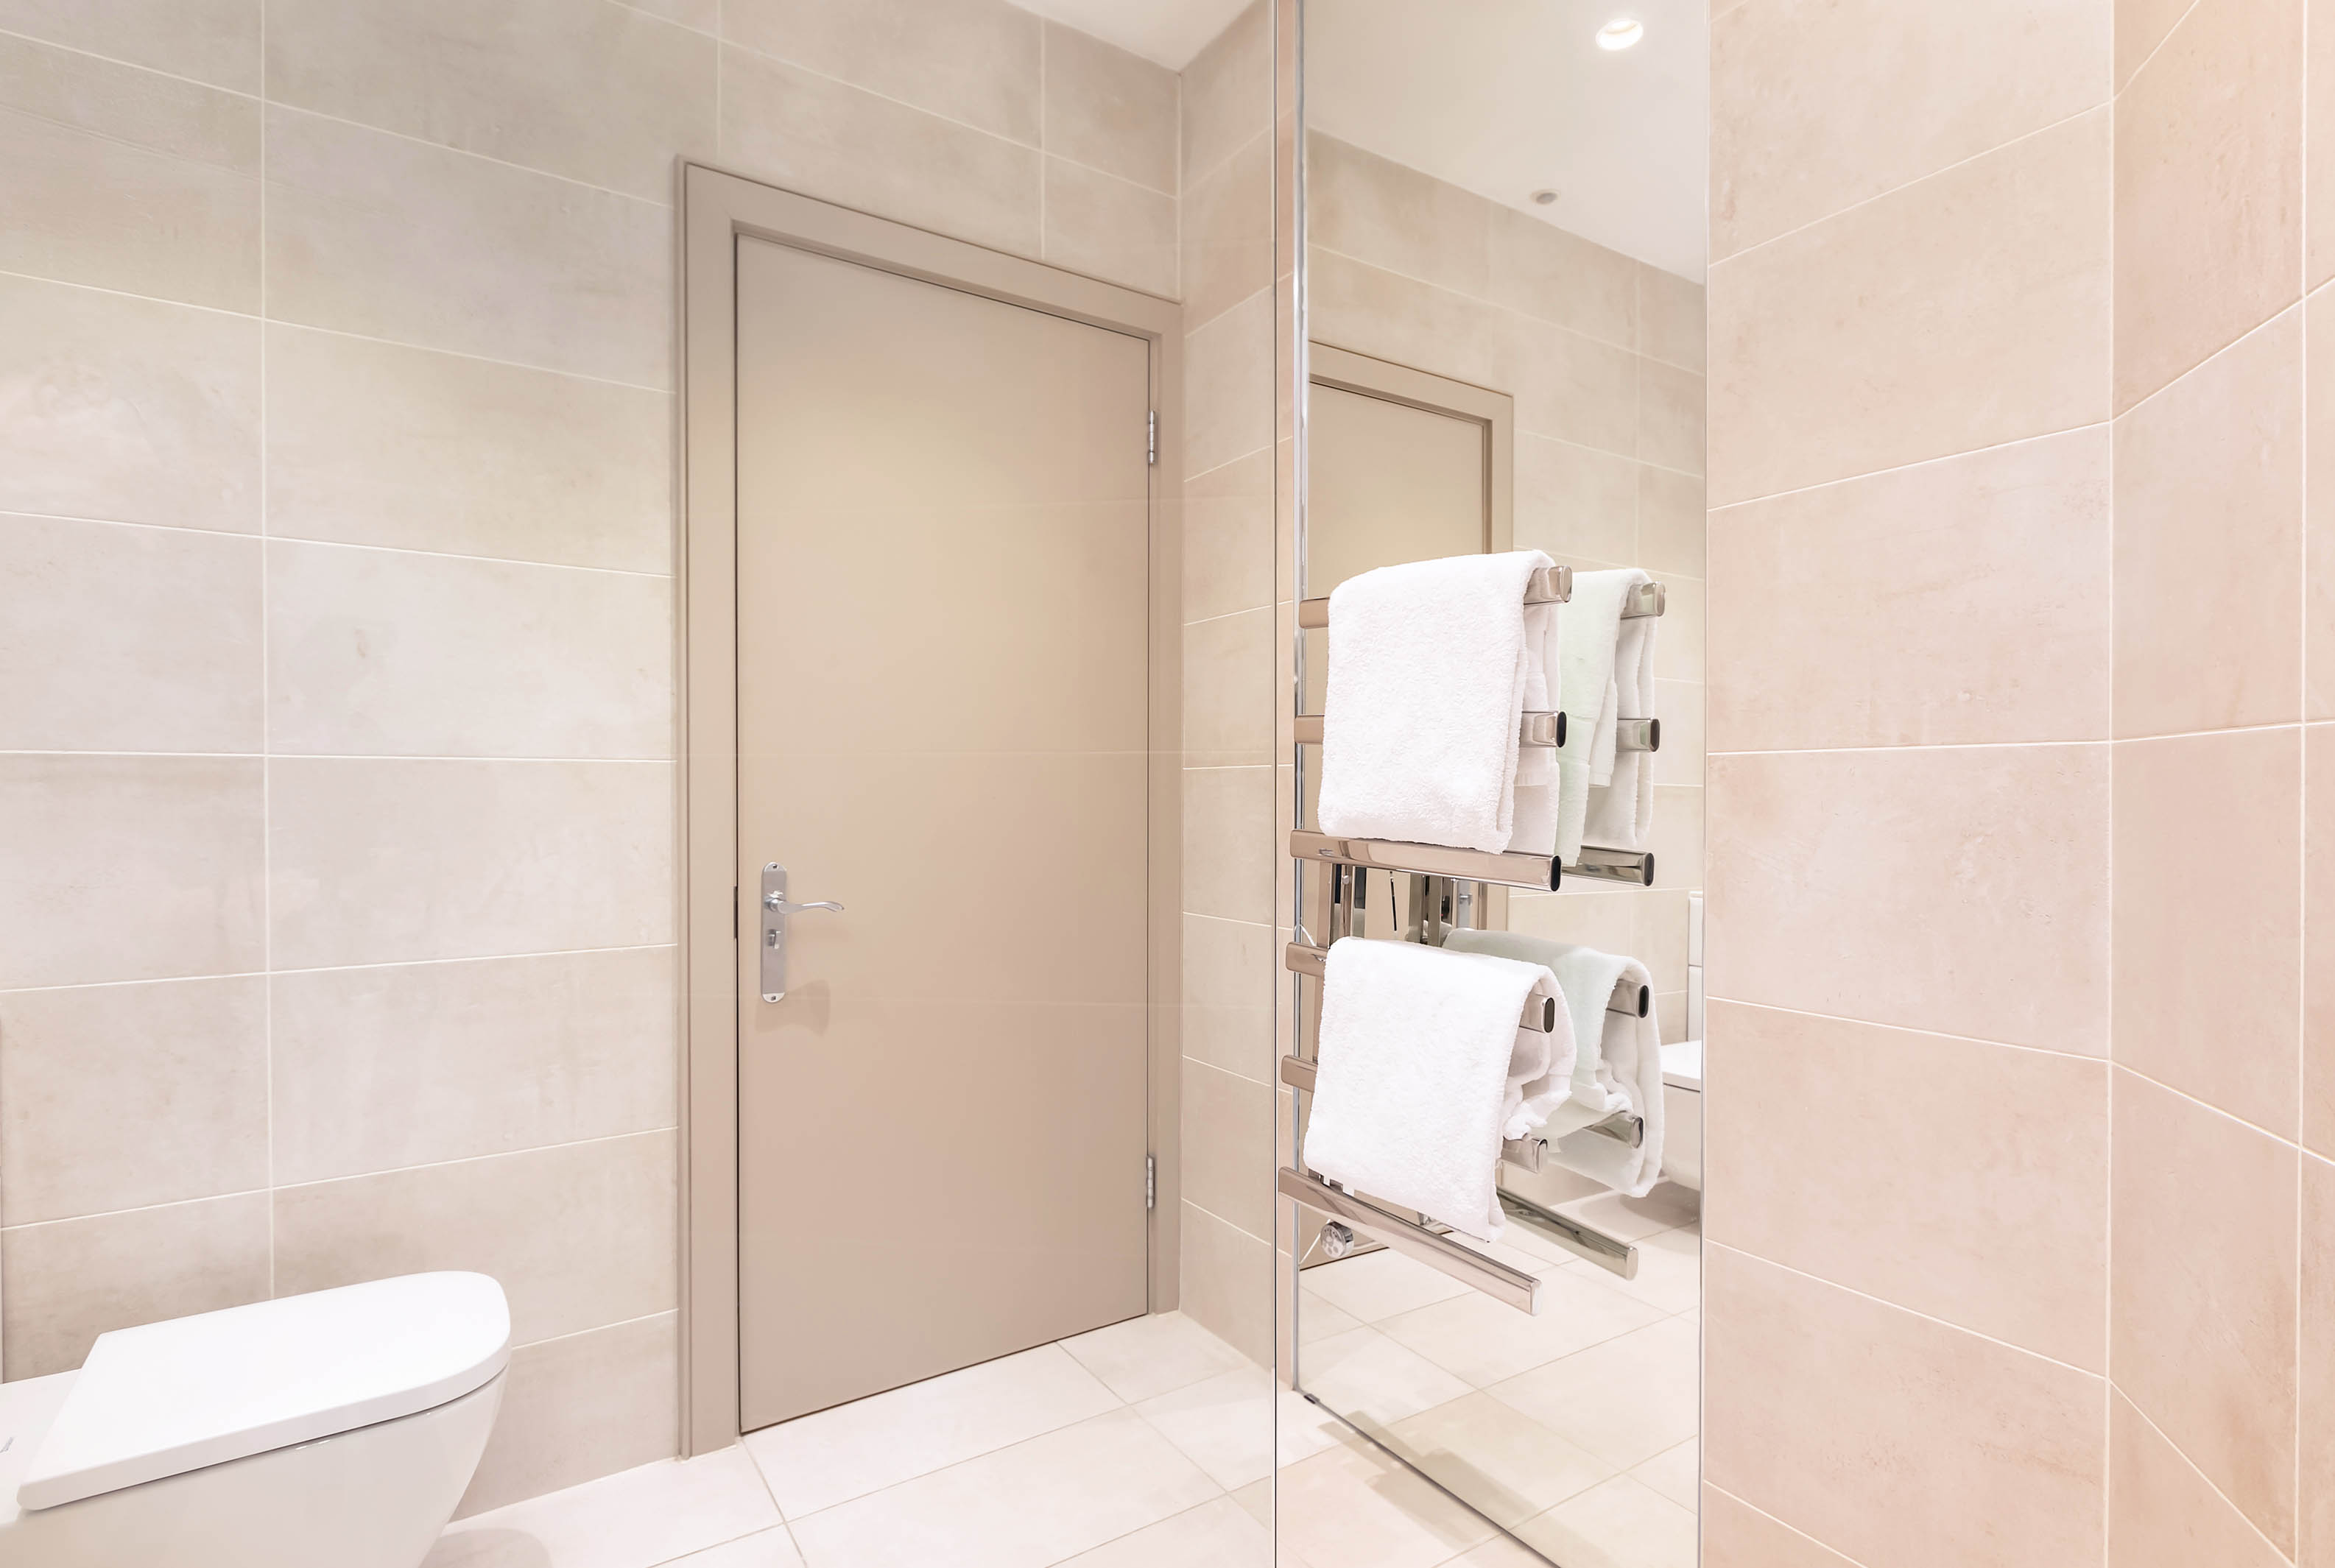 Lovelydays luxury service apartment rental - London - Fitzrovia - Wells Mews B - Lovelysuite - 2 bedrooms - 2 bathrooms - Lovely shower - 457045c607aa - Lovelydays